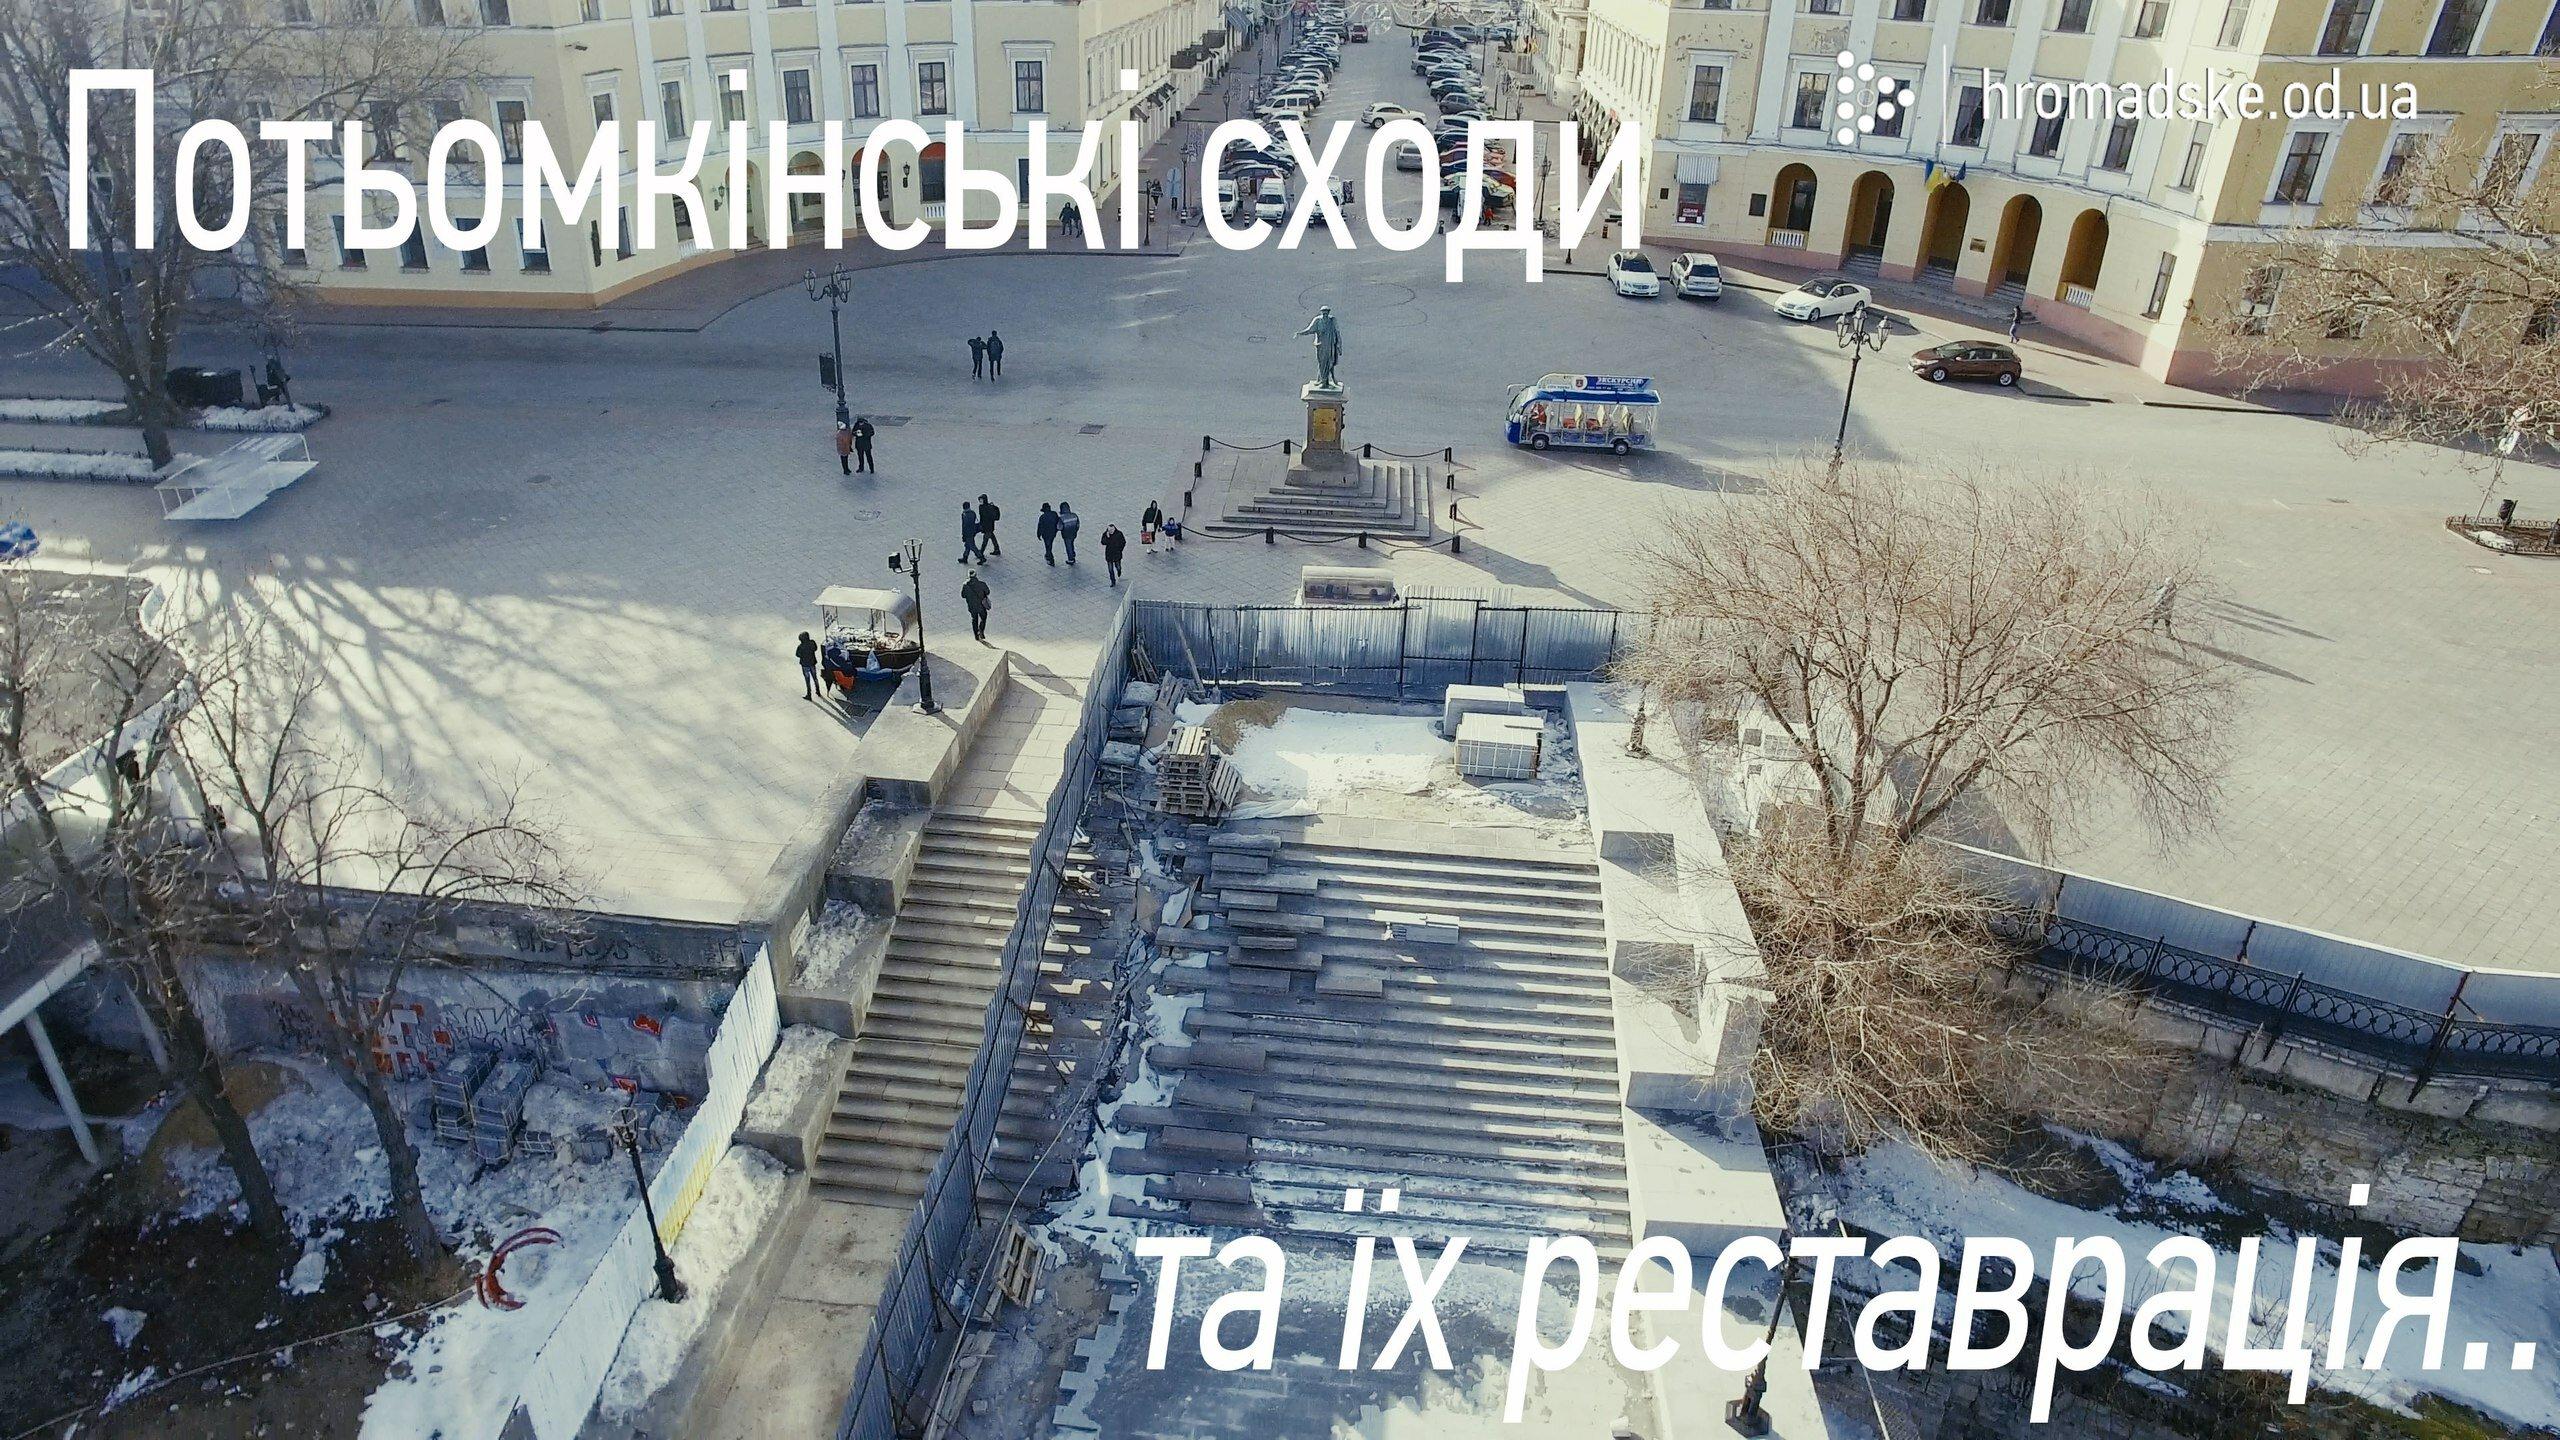 TjX6gT94AdI